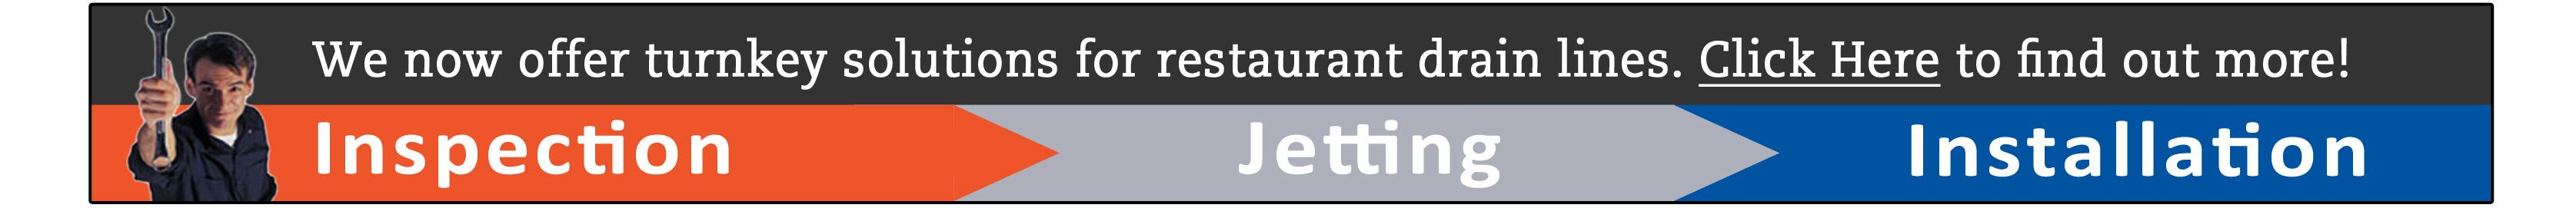 drain line service for restaurants